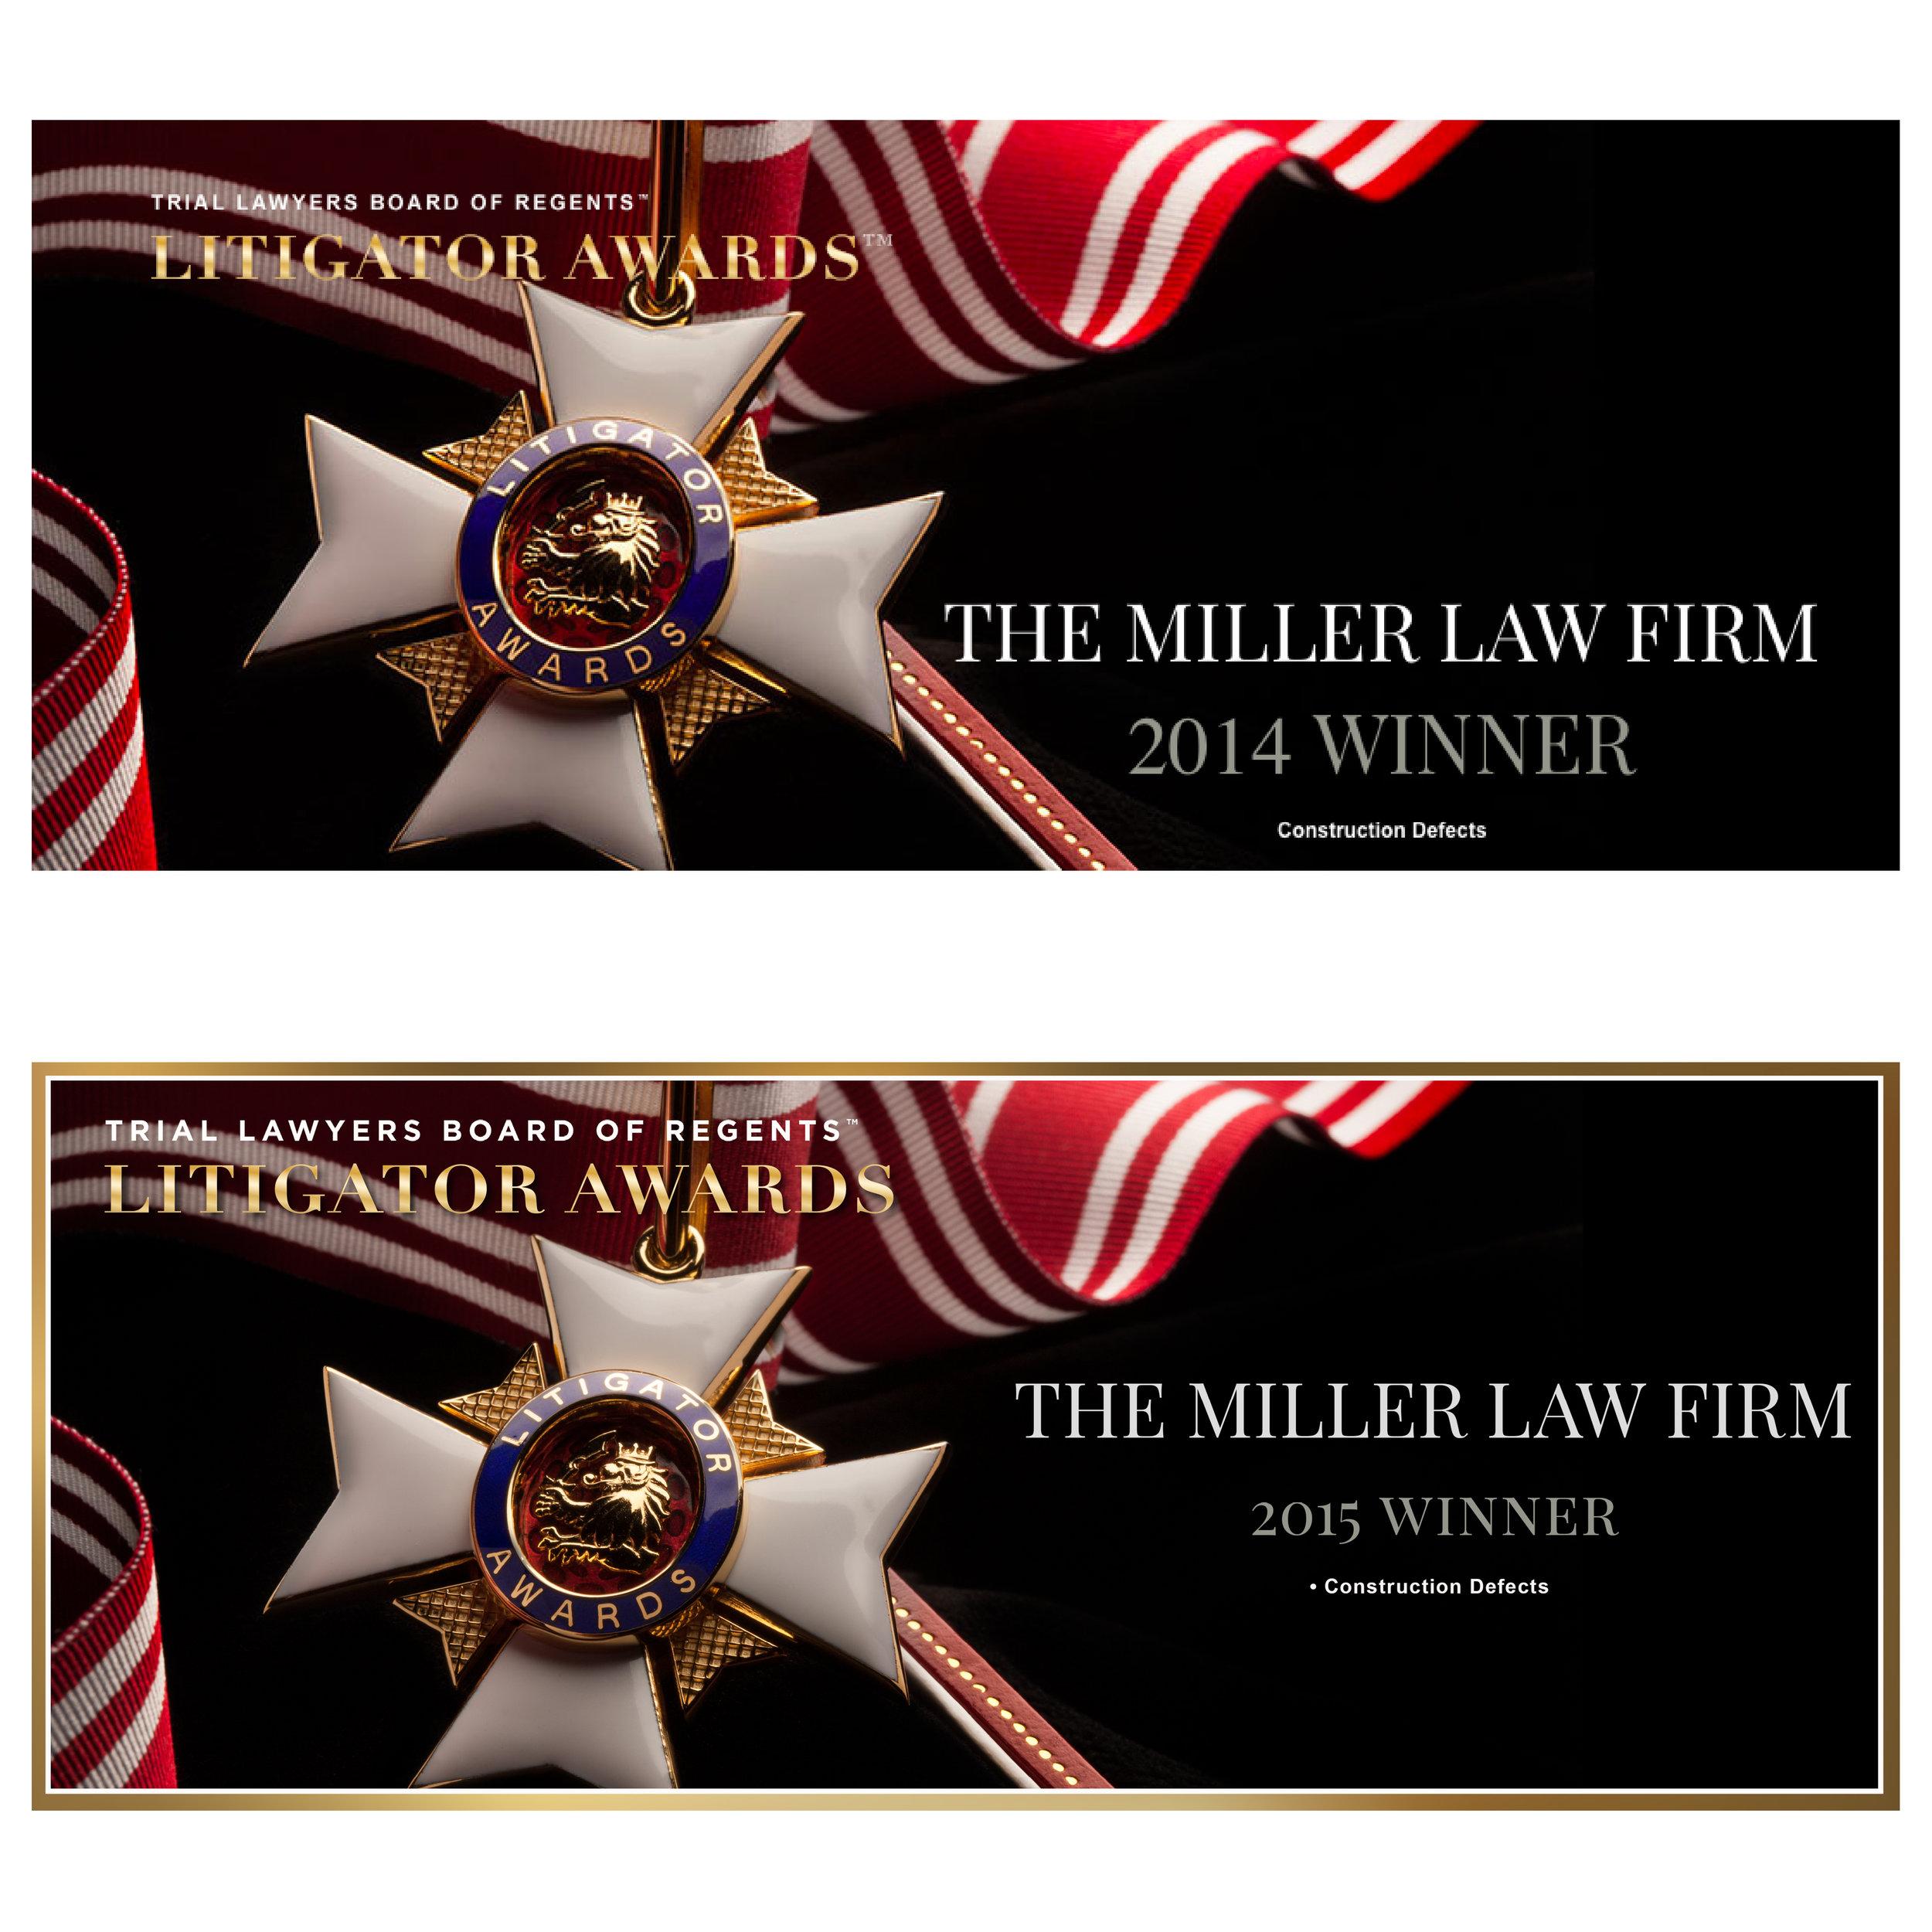 Litigator Awards